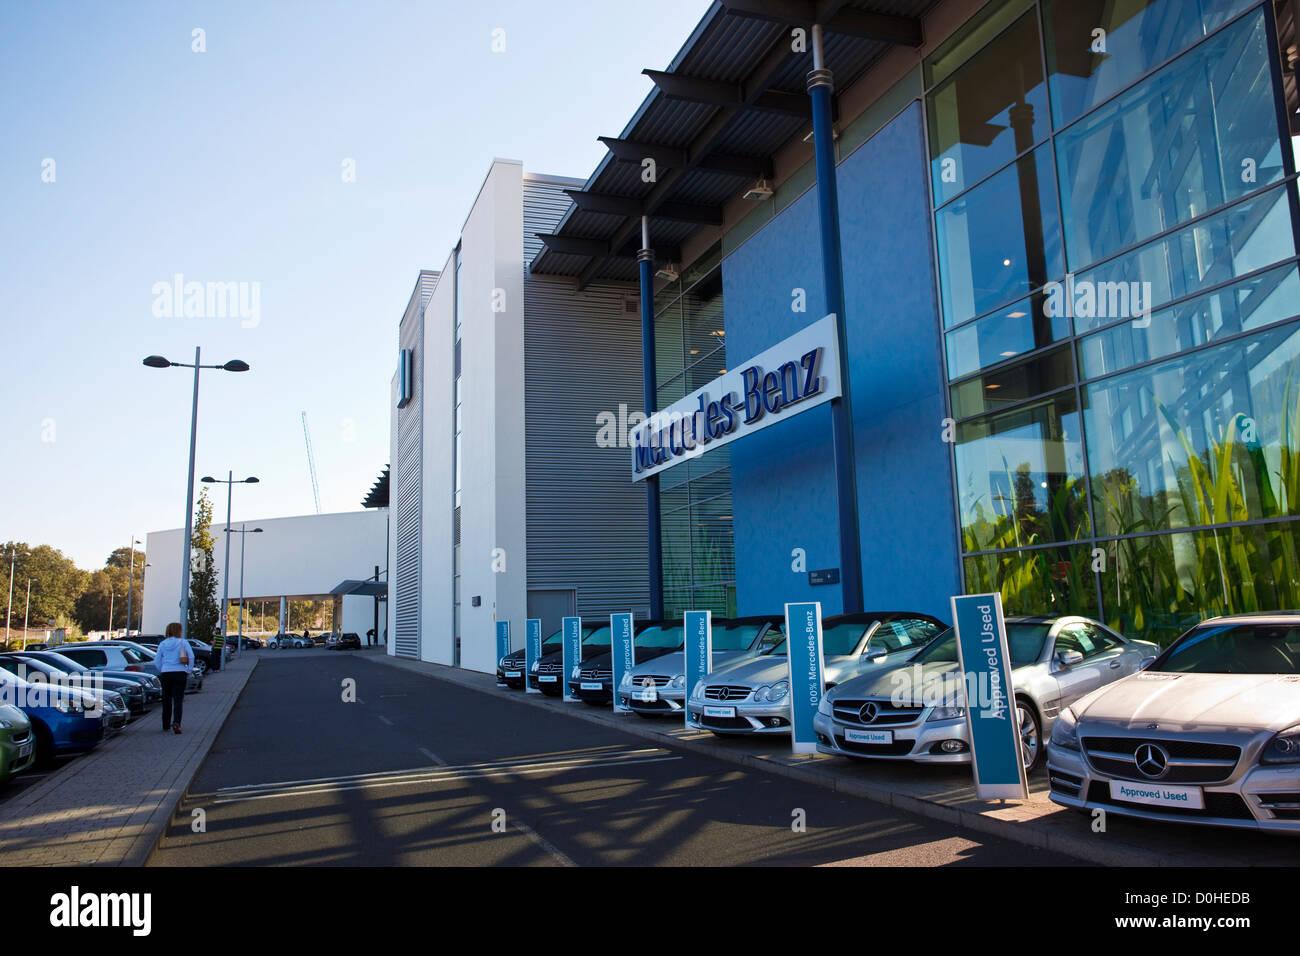 Mercedes-Benz World, Brooklands, Weybridge, Surrey, England, UK Stock Photo